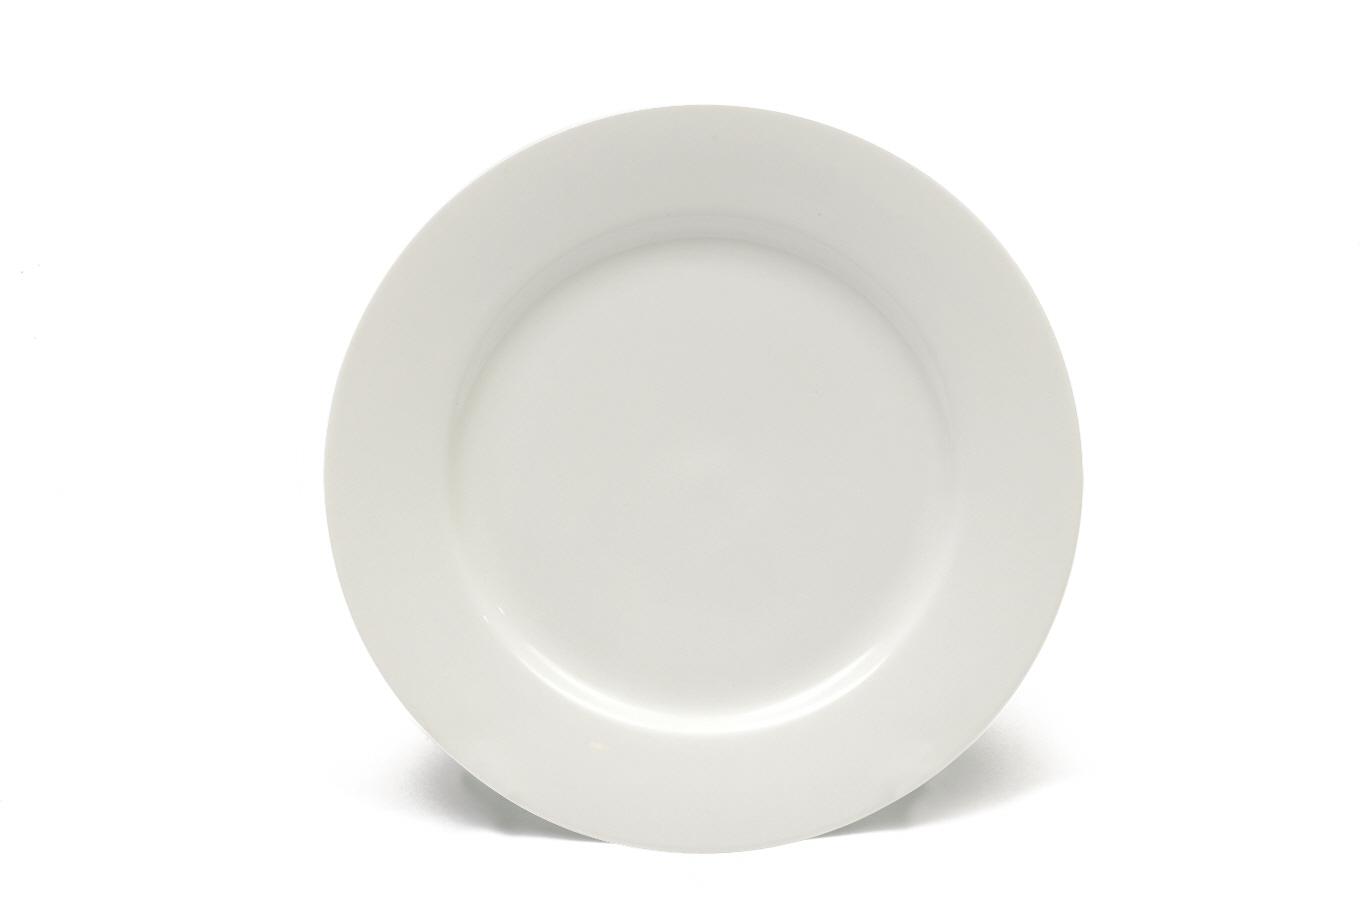 Porcelánový Dezertní talíř White Basics 19 cm 4 ks - Maxwell&Williams